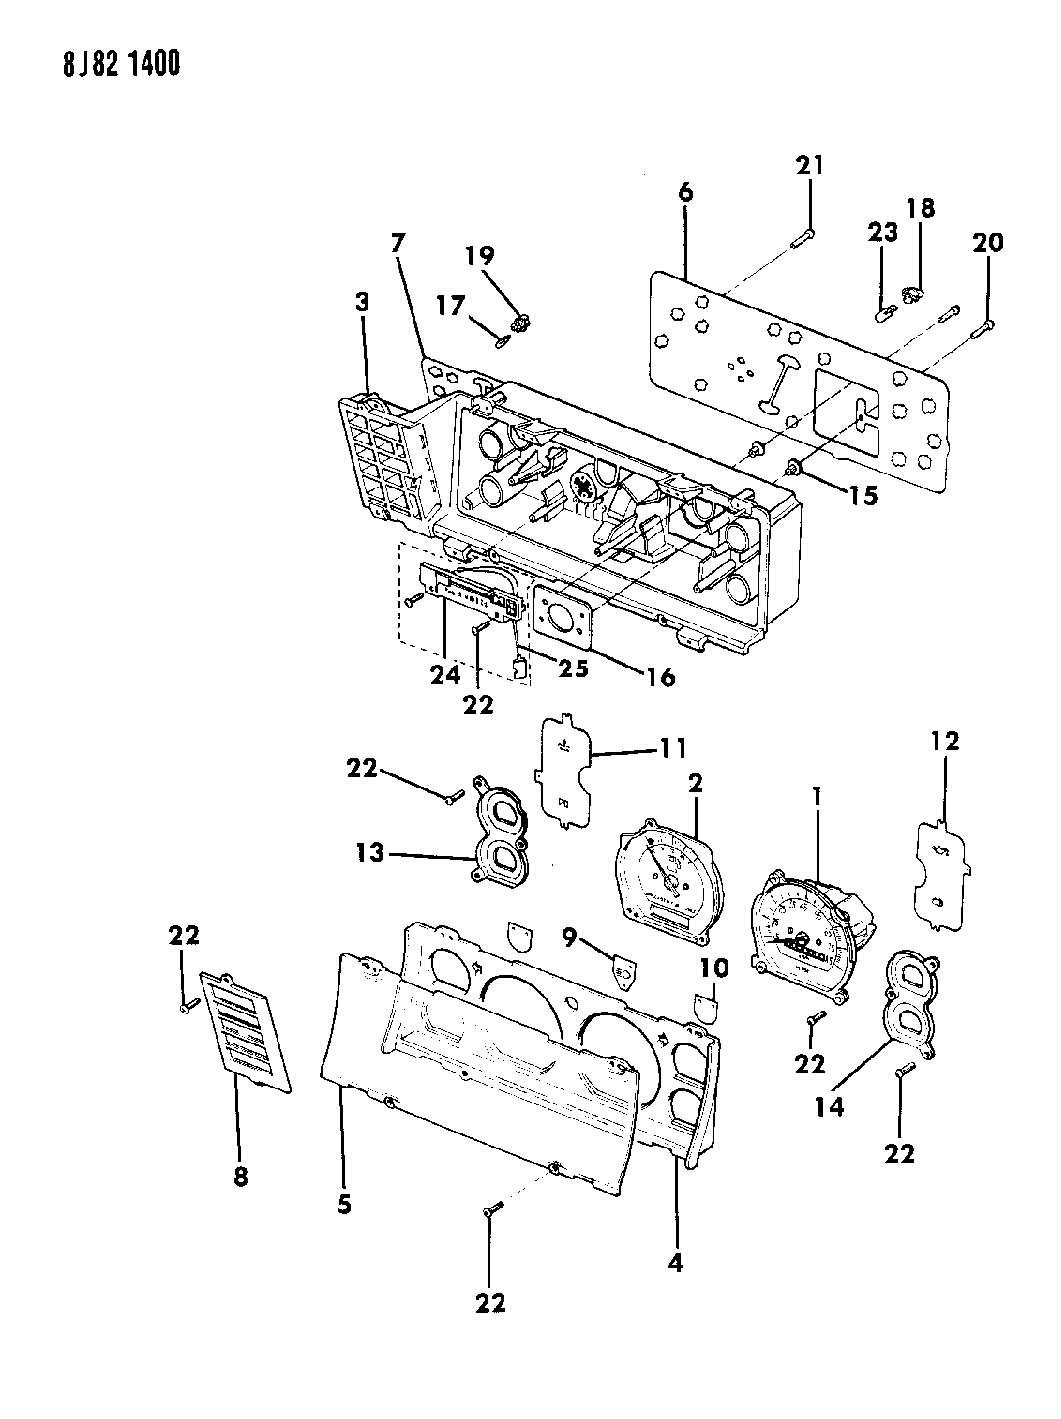 tags: #sunpro tach wiring diagram#sun tach wiring diagram nissan#equus tach  wiring diagram#sun tachometer wiring#pro tach wiring diagram#msd 6al wiring